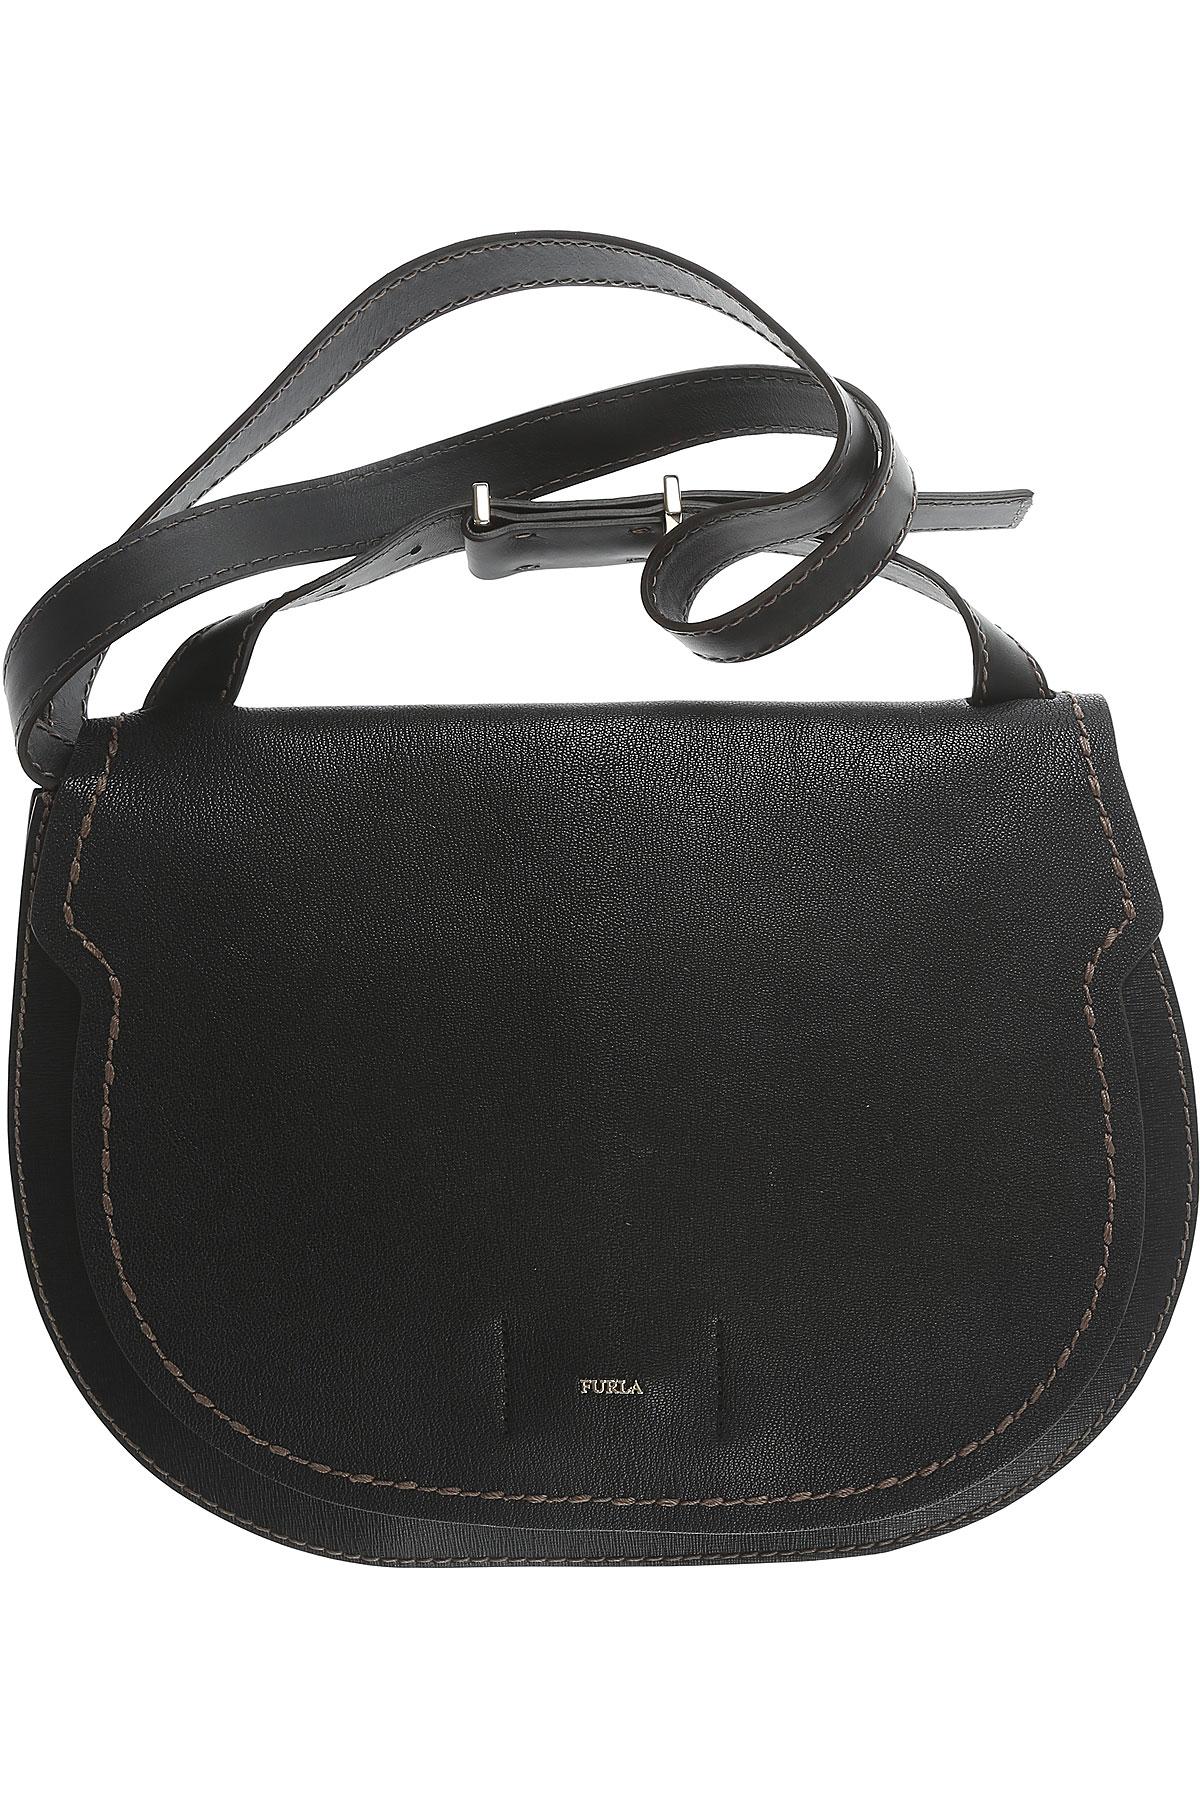 Furla Shoulder Bag for Women On Sale in Outlet, Onyx, Leather, 2017